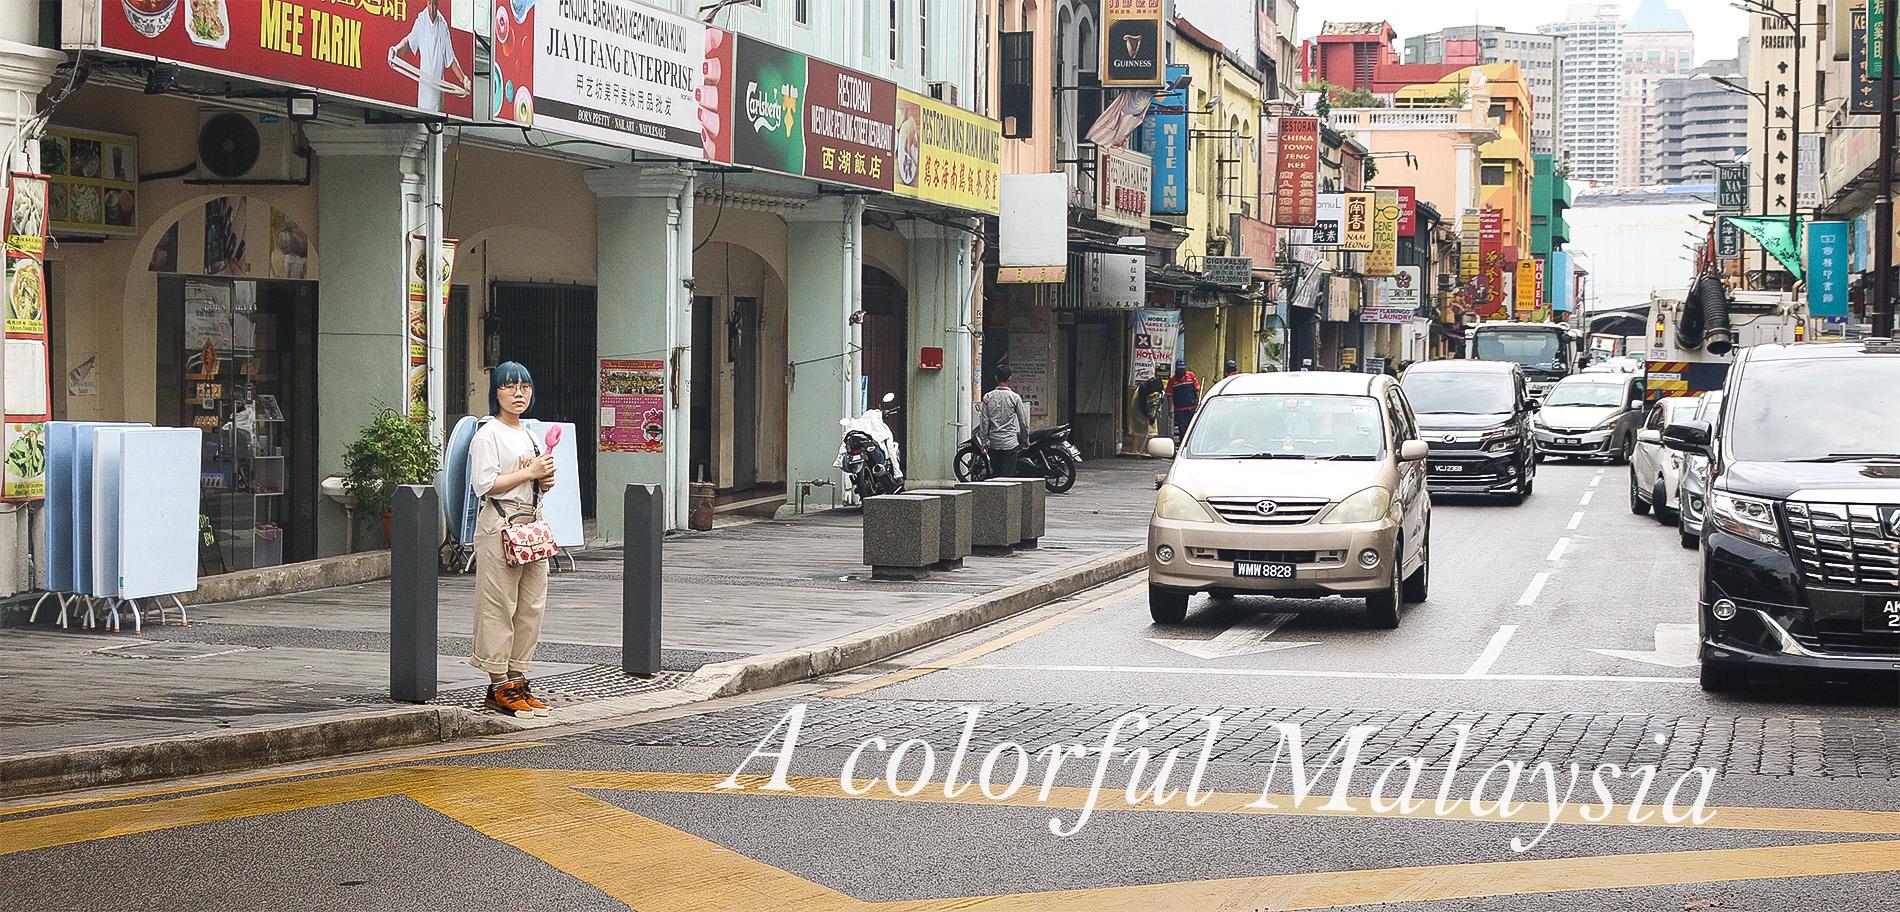 Checkin-Holic: A colorful Malaysia - Lê Vũ Thái Bảo